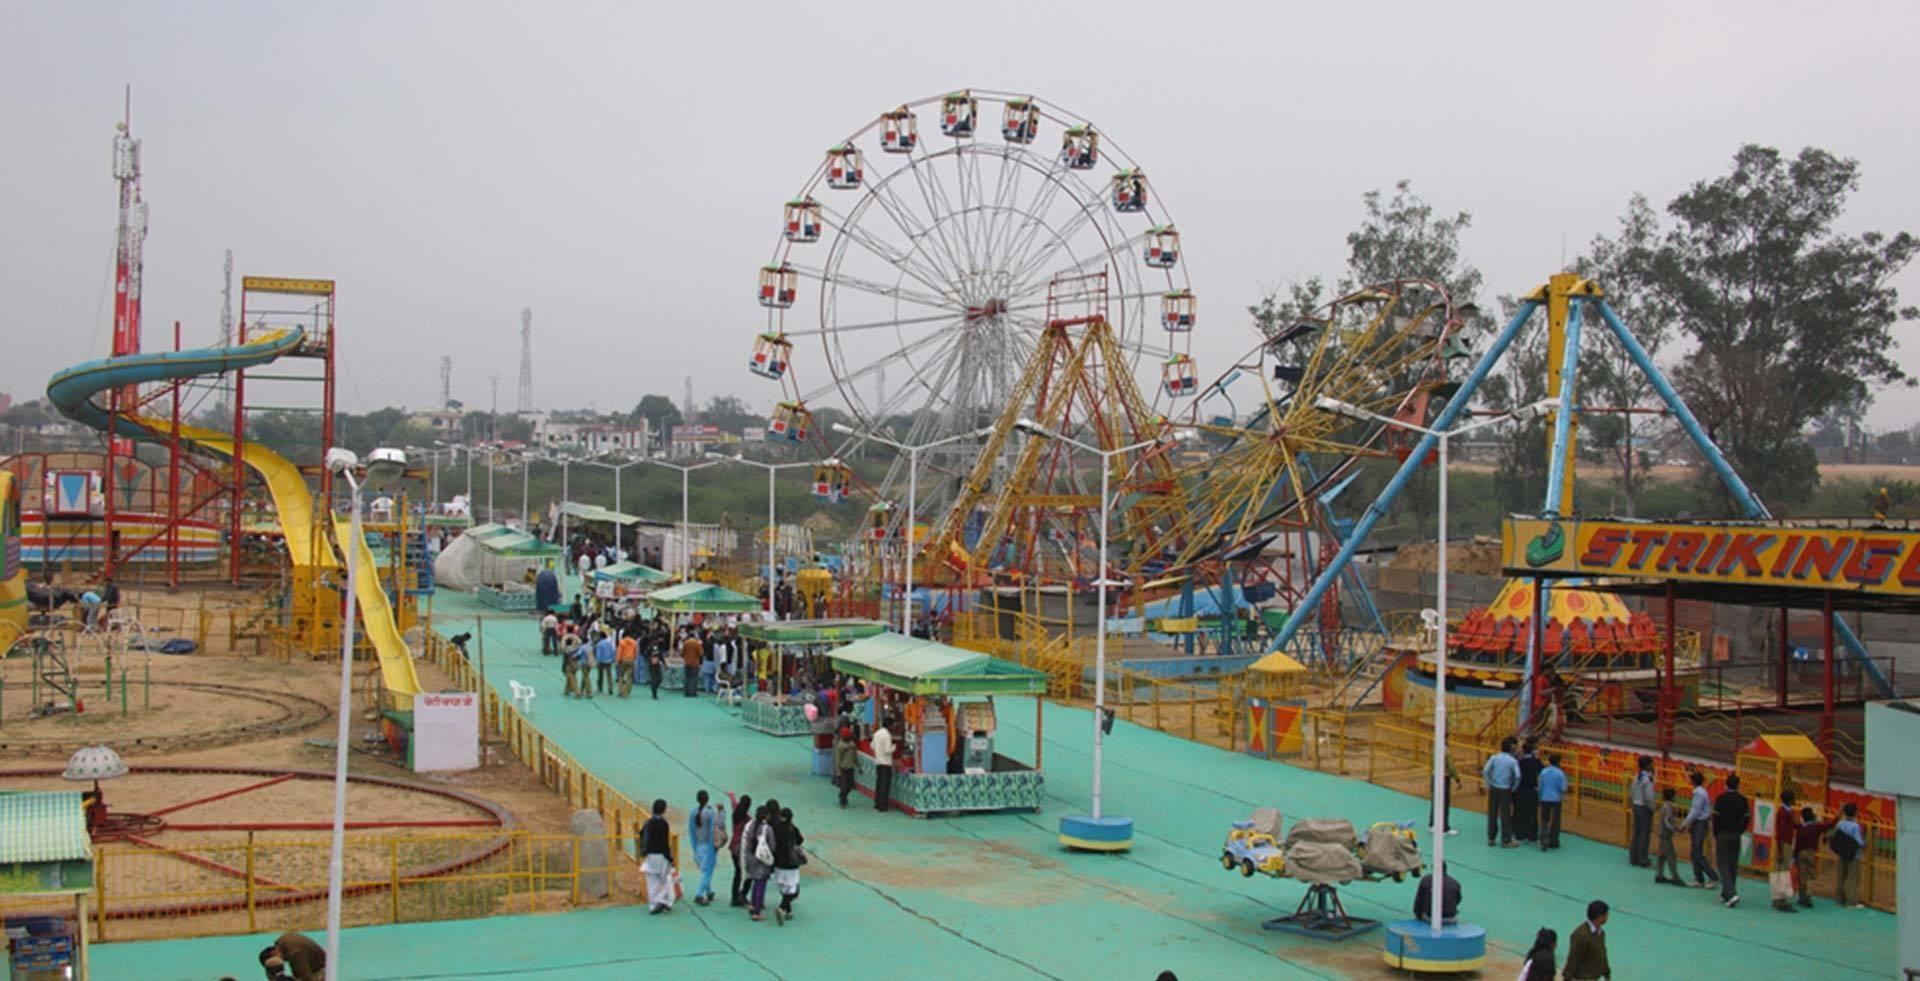 http://www.getbookcab.com/Admin/images/faridabad.jpeg